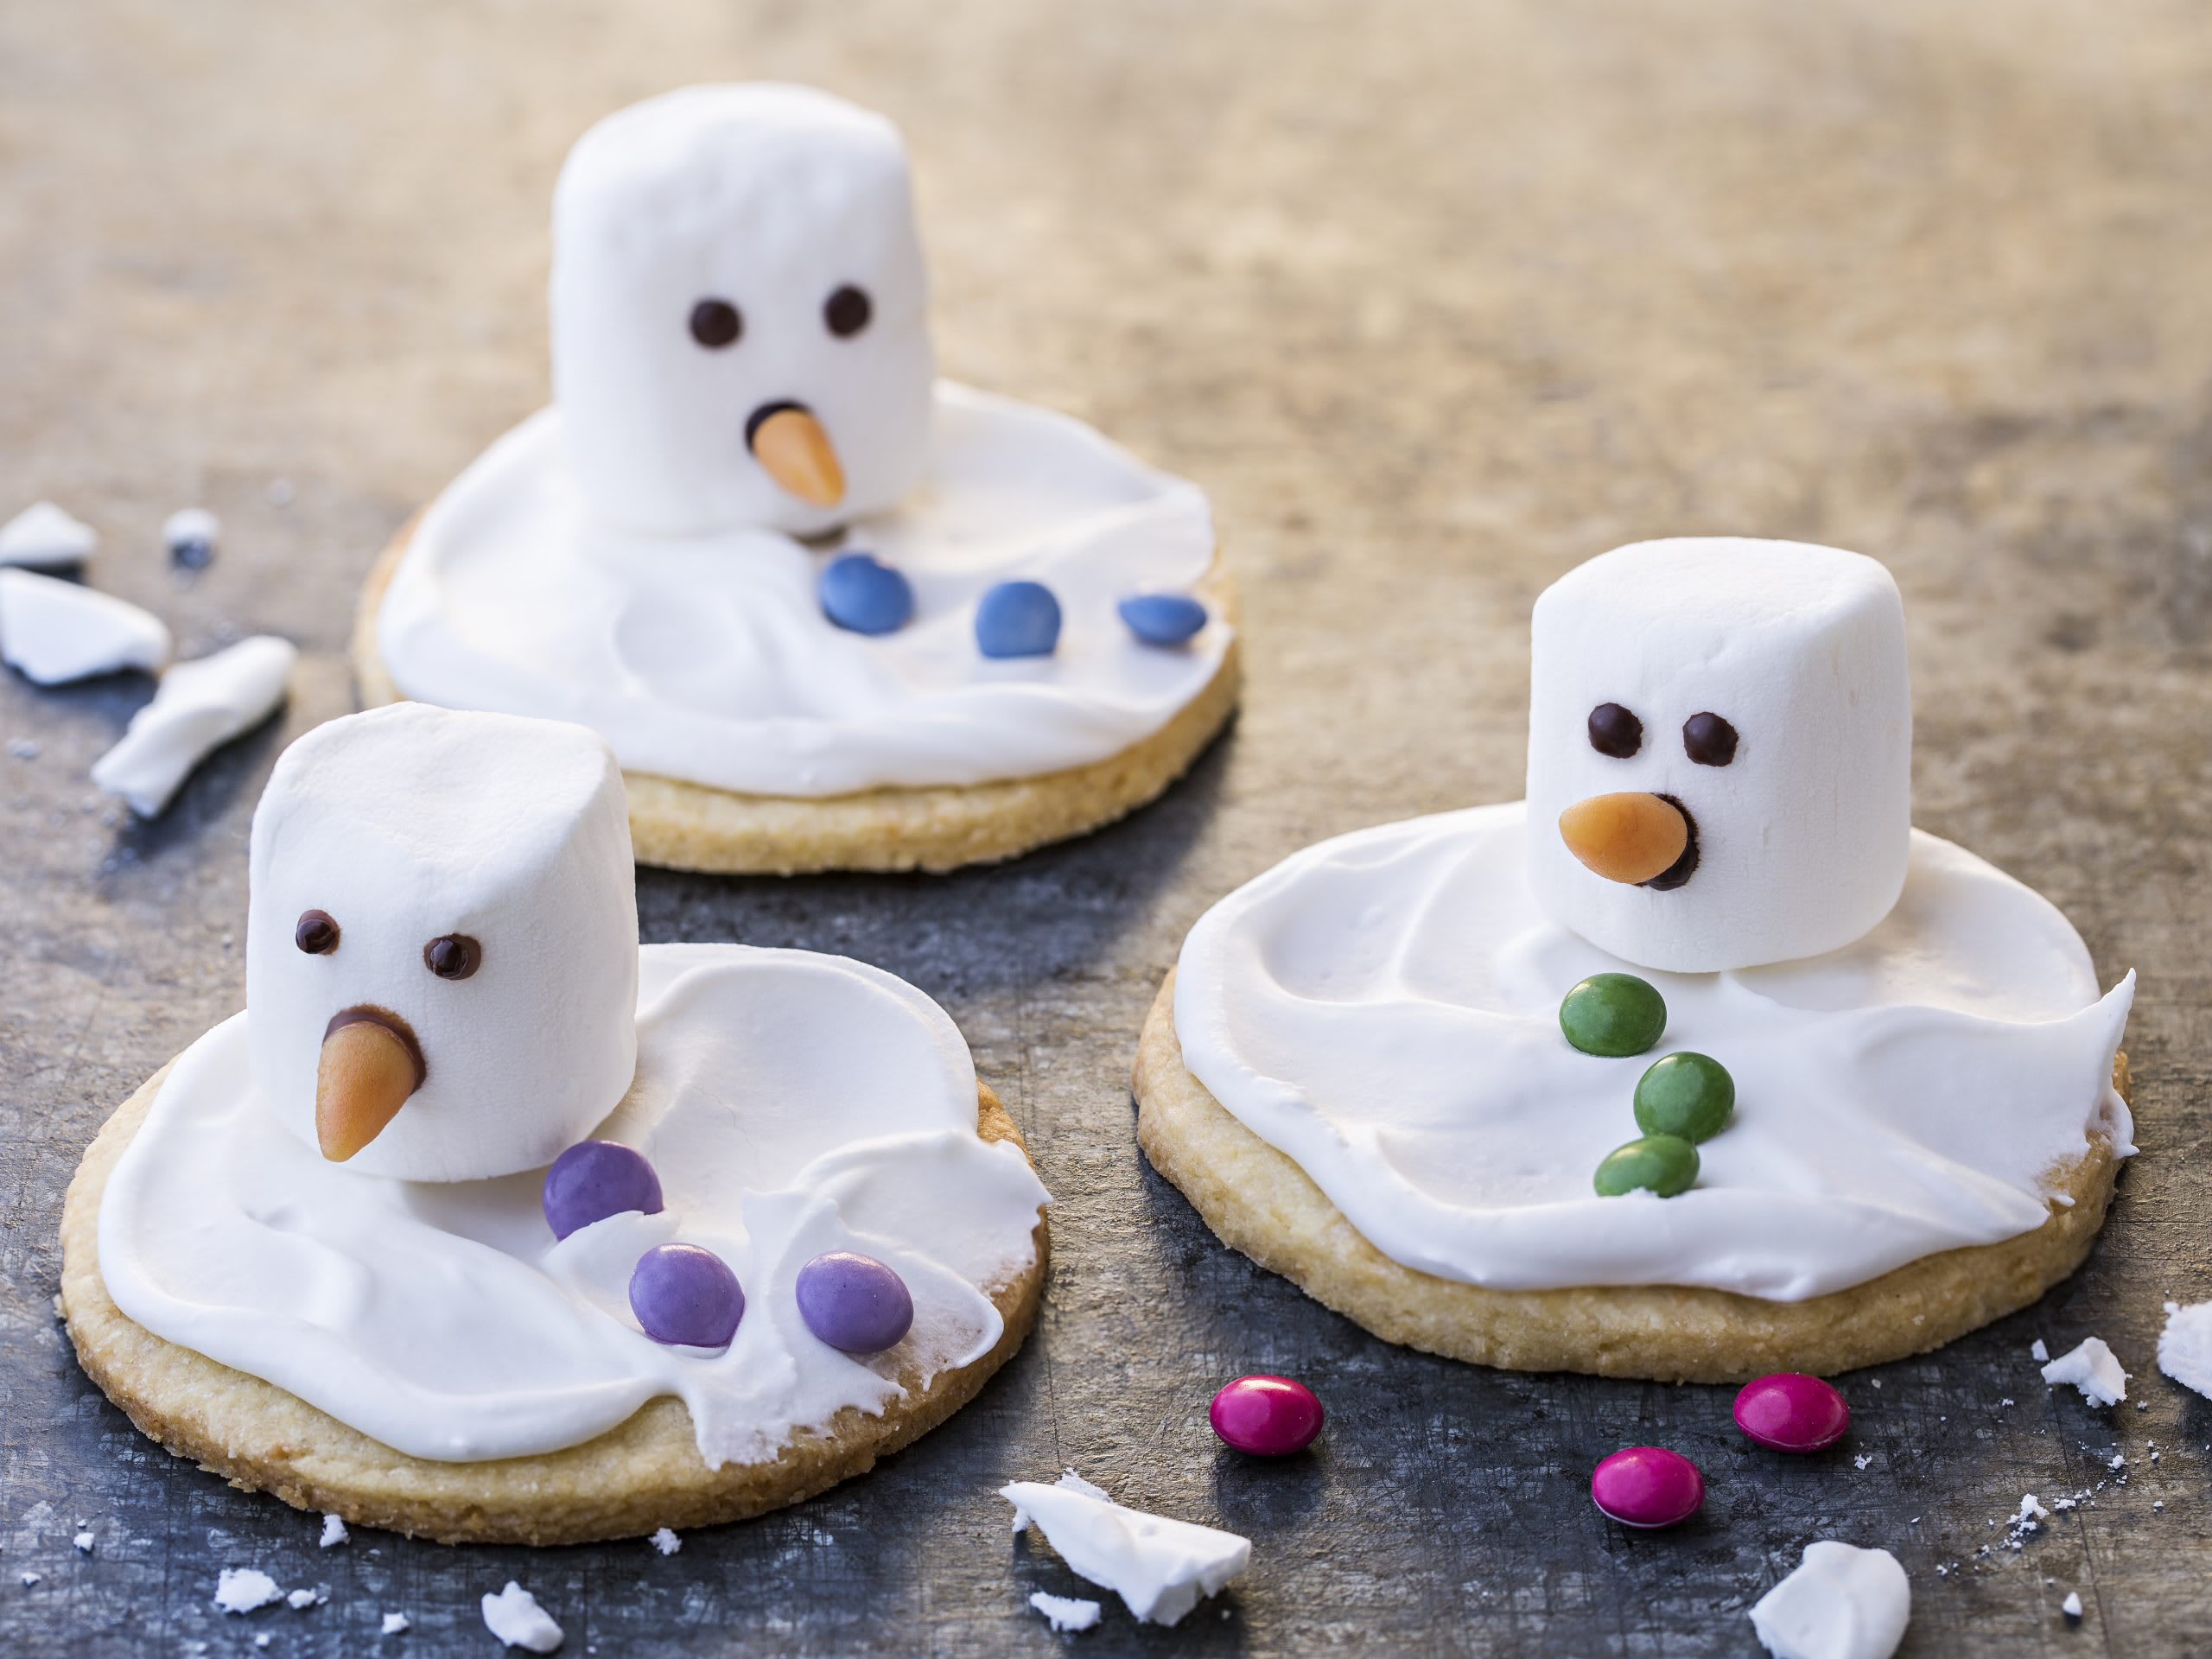 Biscuits bonhomme de neige fondu